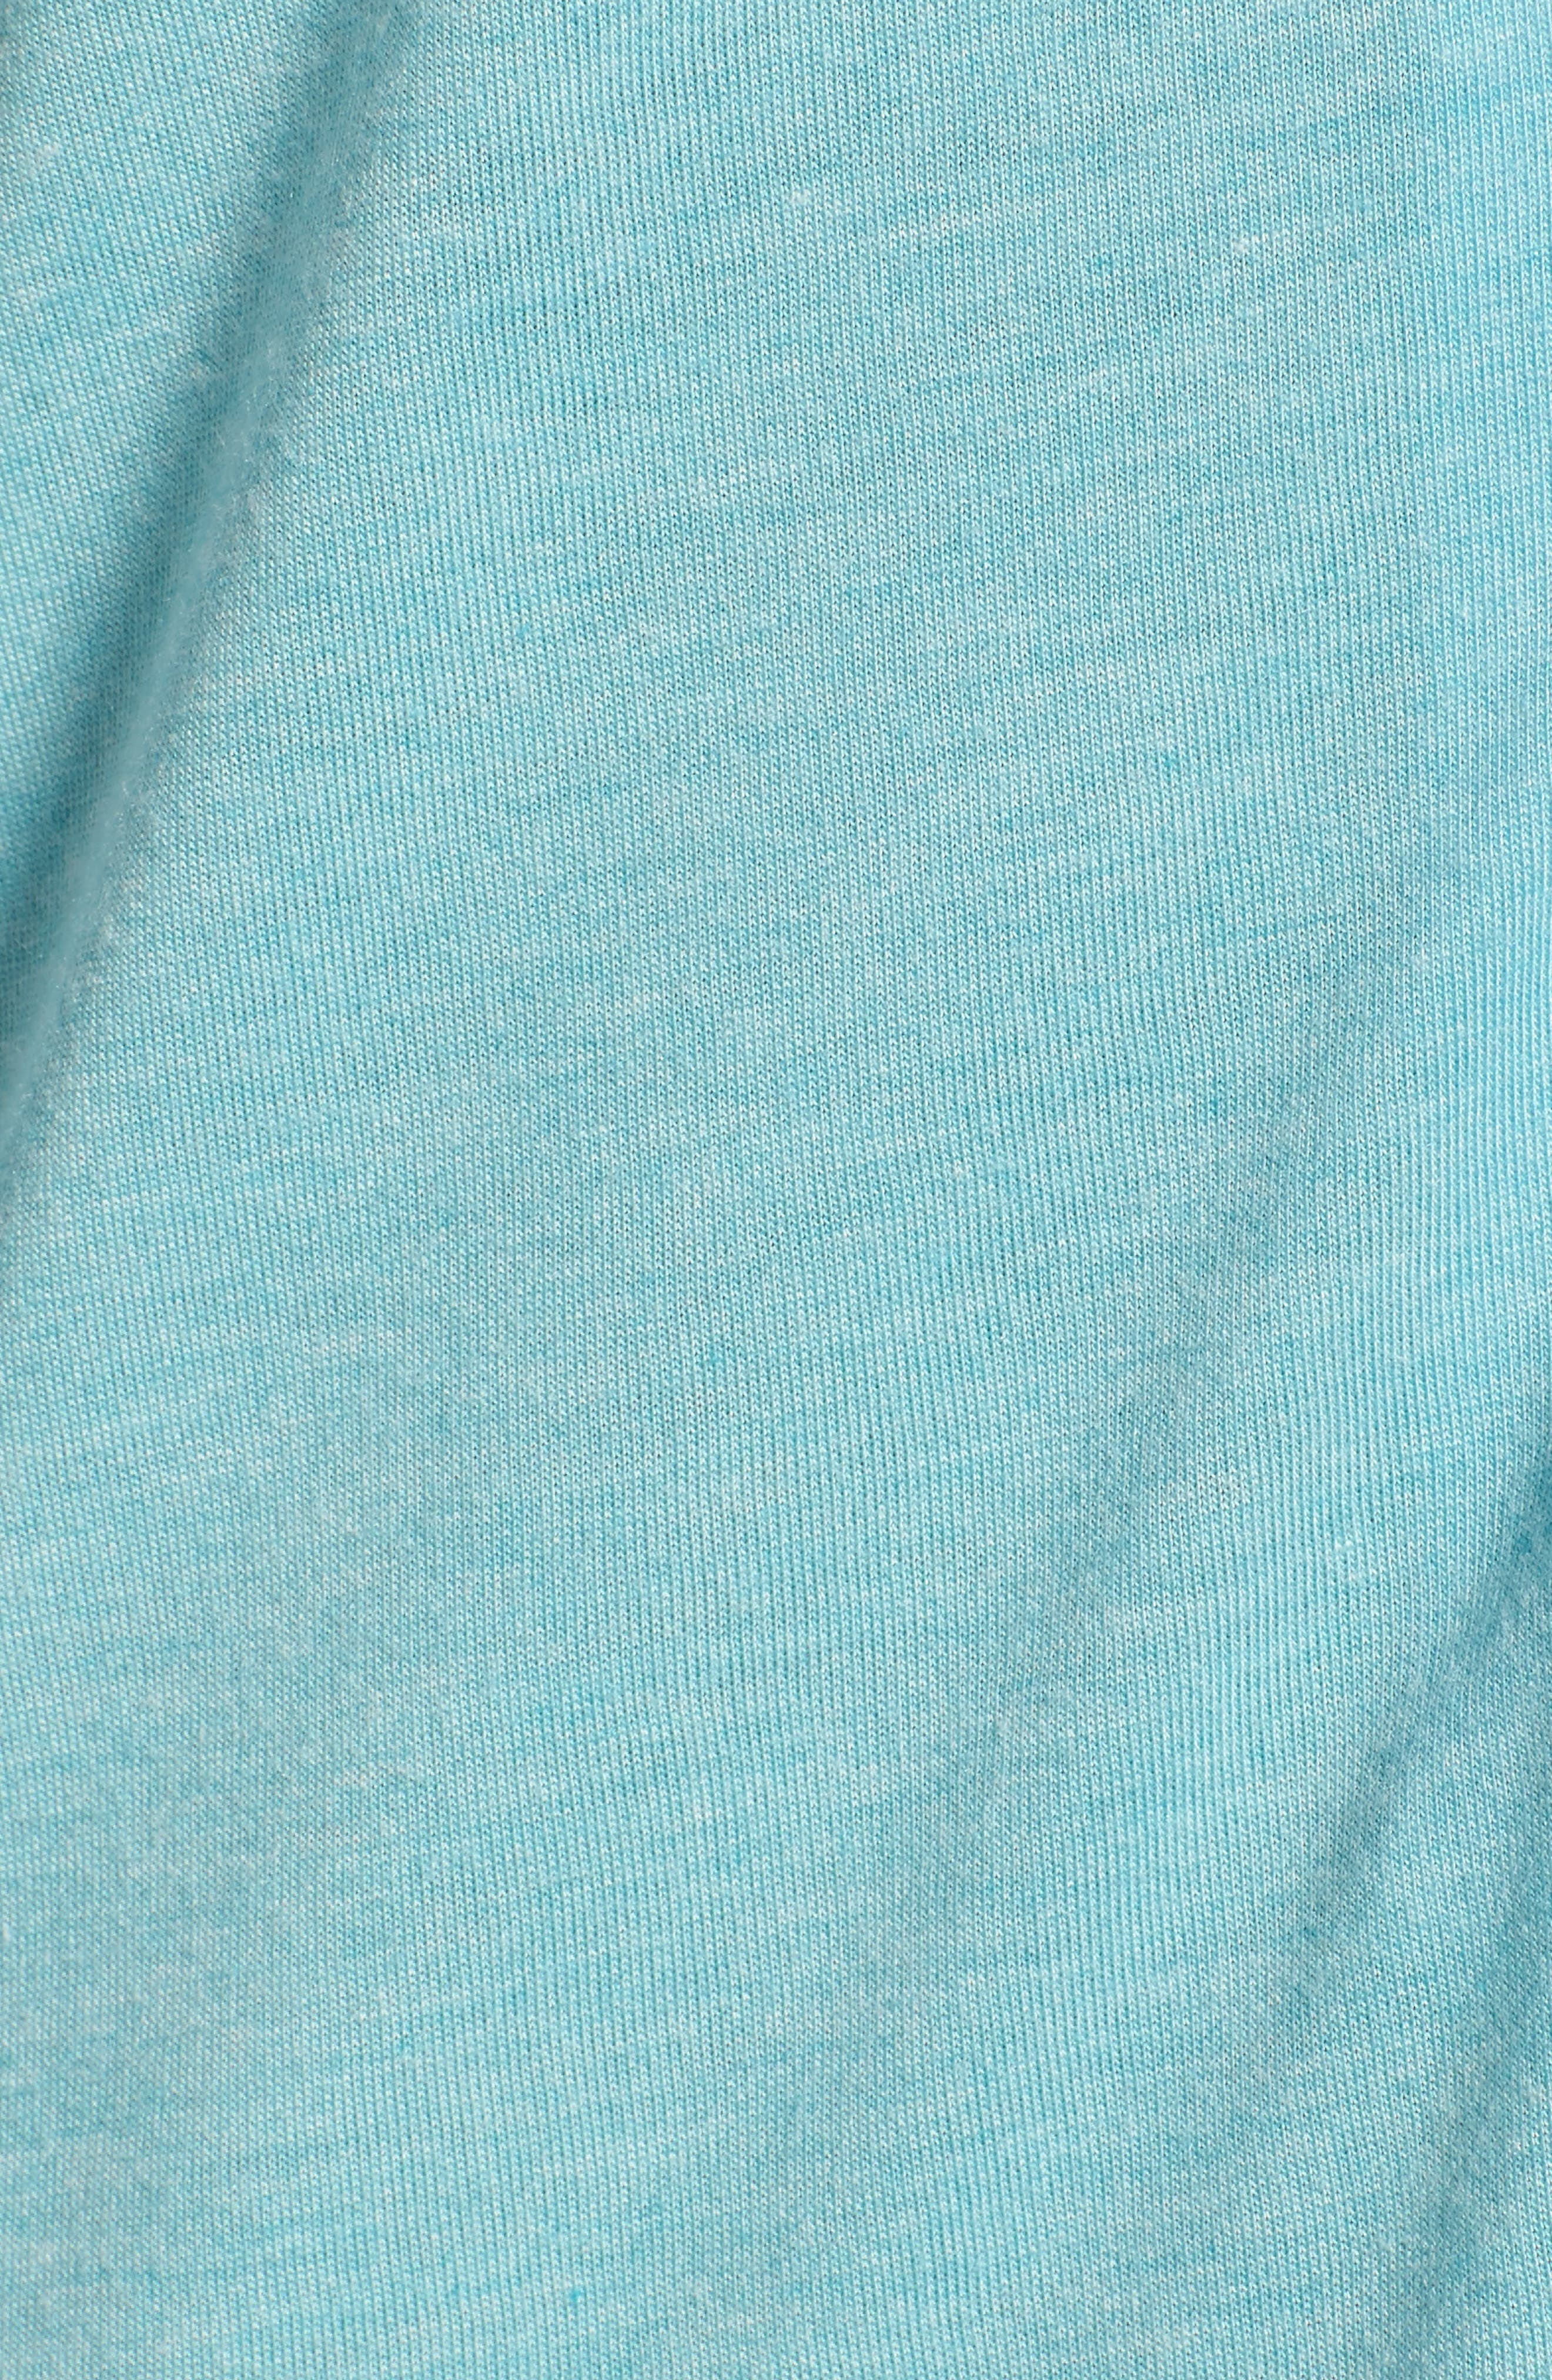 Shangri-La Sleep Shirt,                             Alternate thumbnail 6, color,                             Turquoise